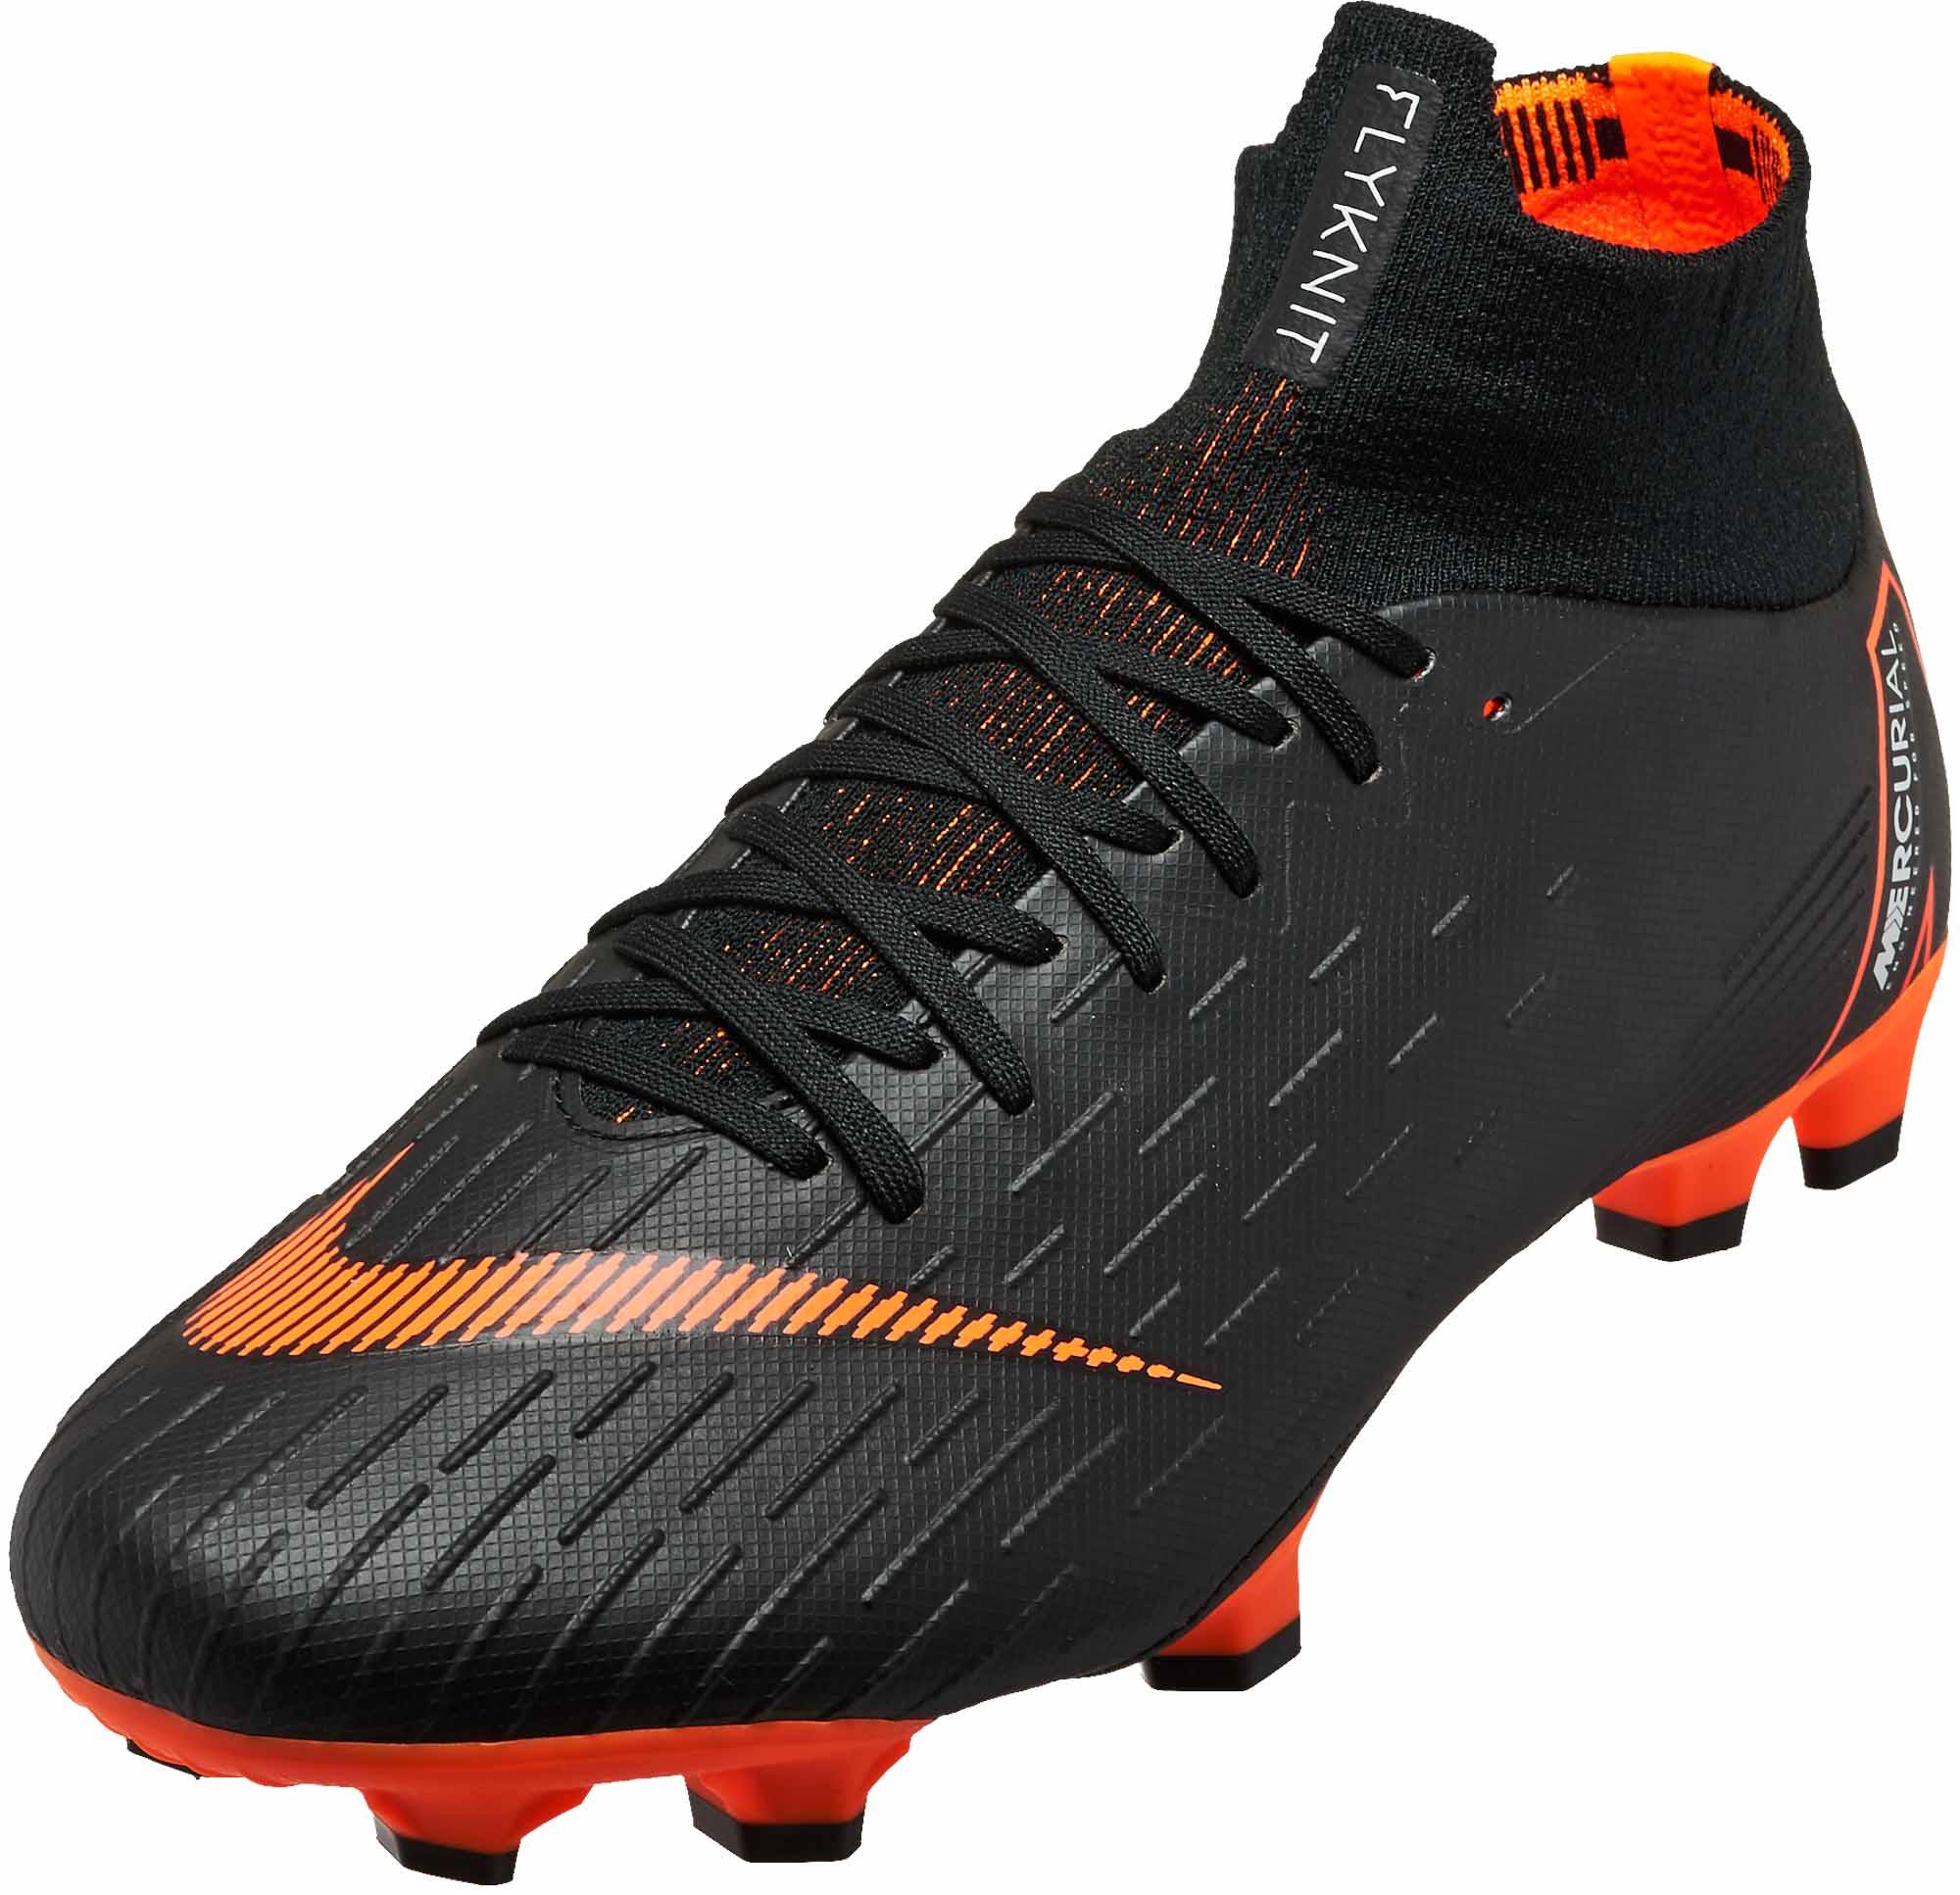 c8cfa6416c1 Nike Superfly 6 Pro FG - Black Total Orange - SoccerPro